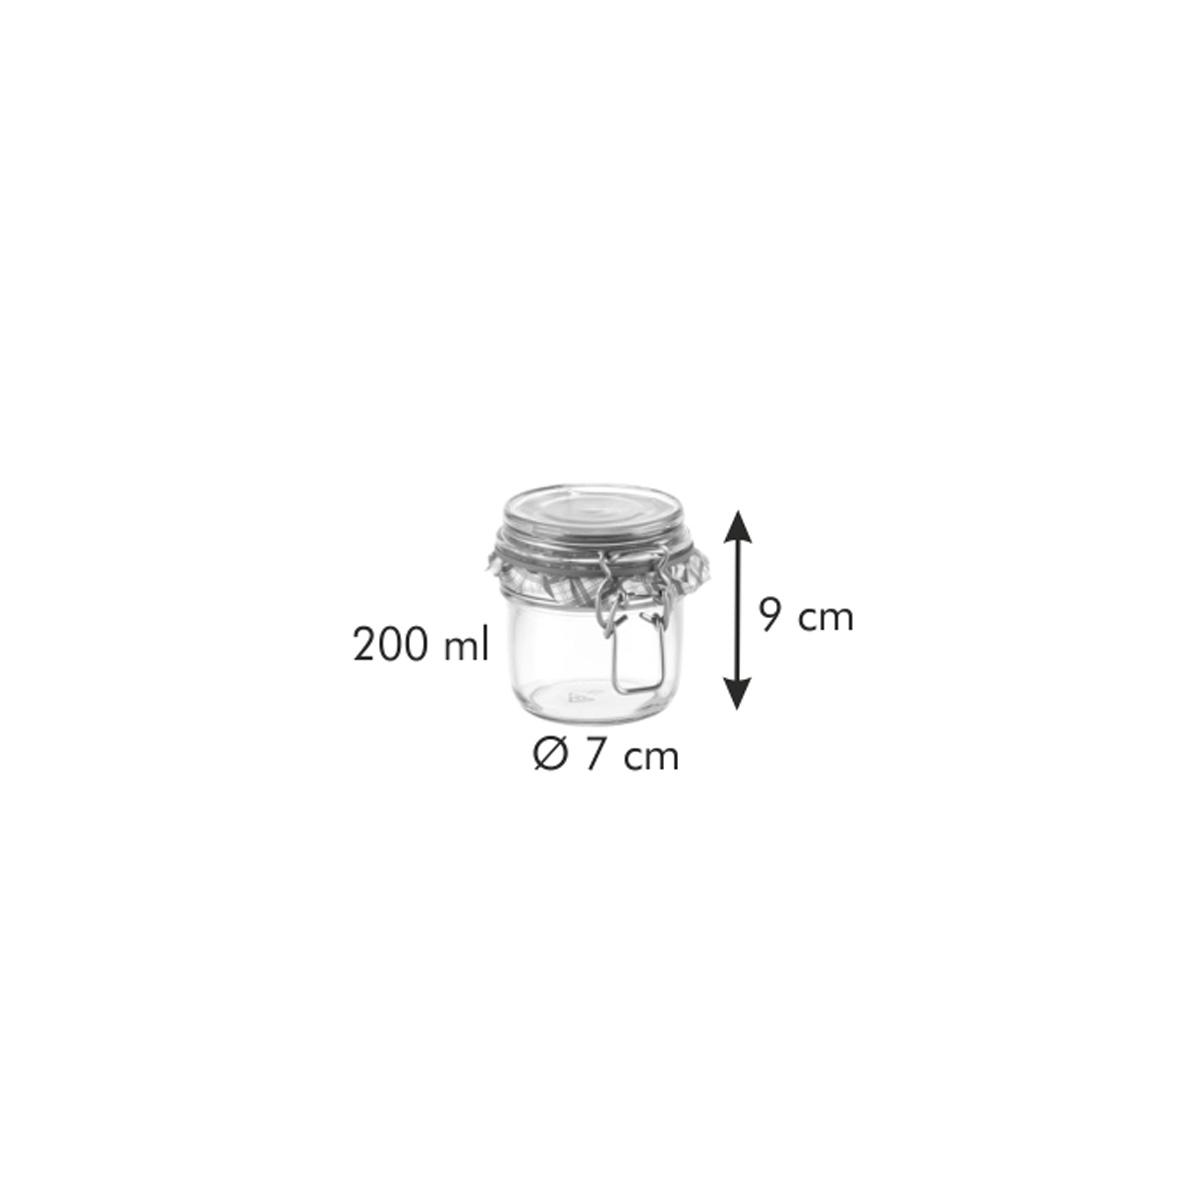 Zavařovací sklenice s klipem TESCOMA DELLA CASA 200 ml